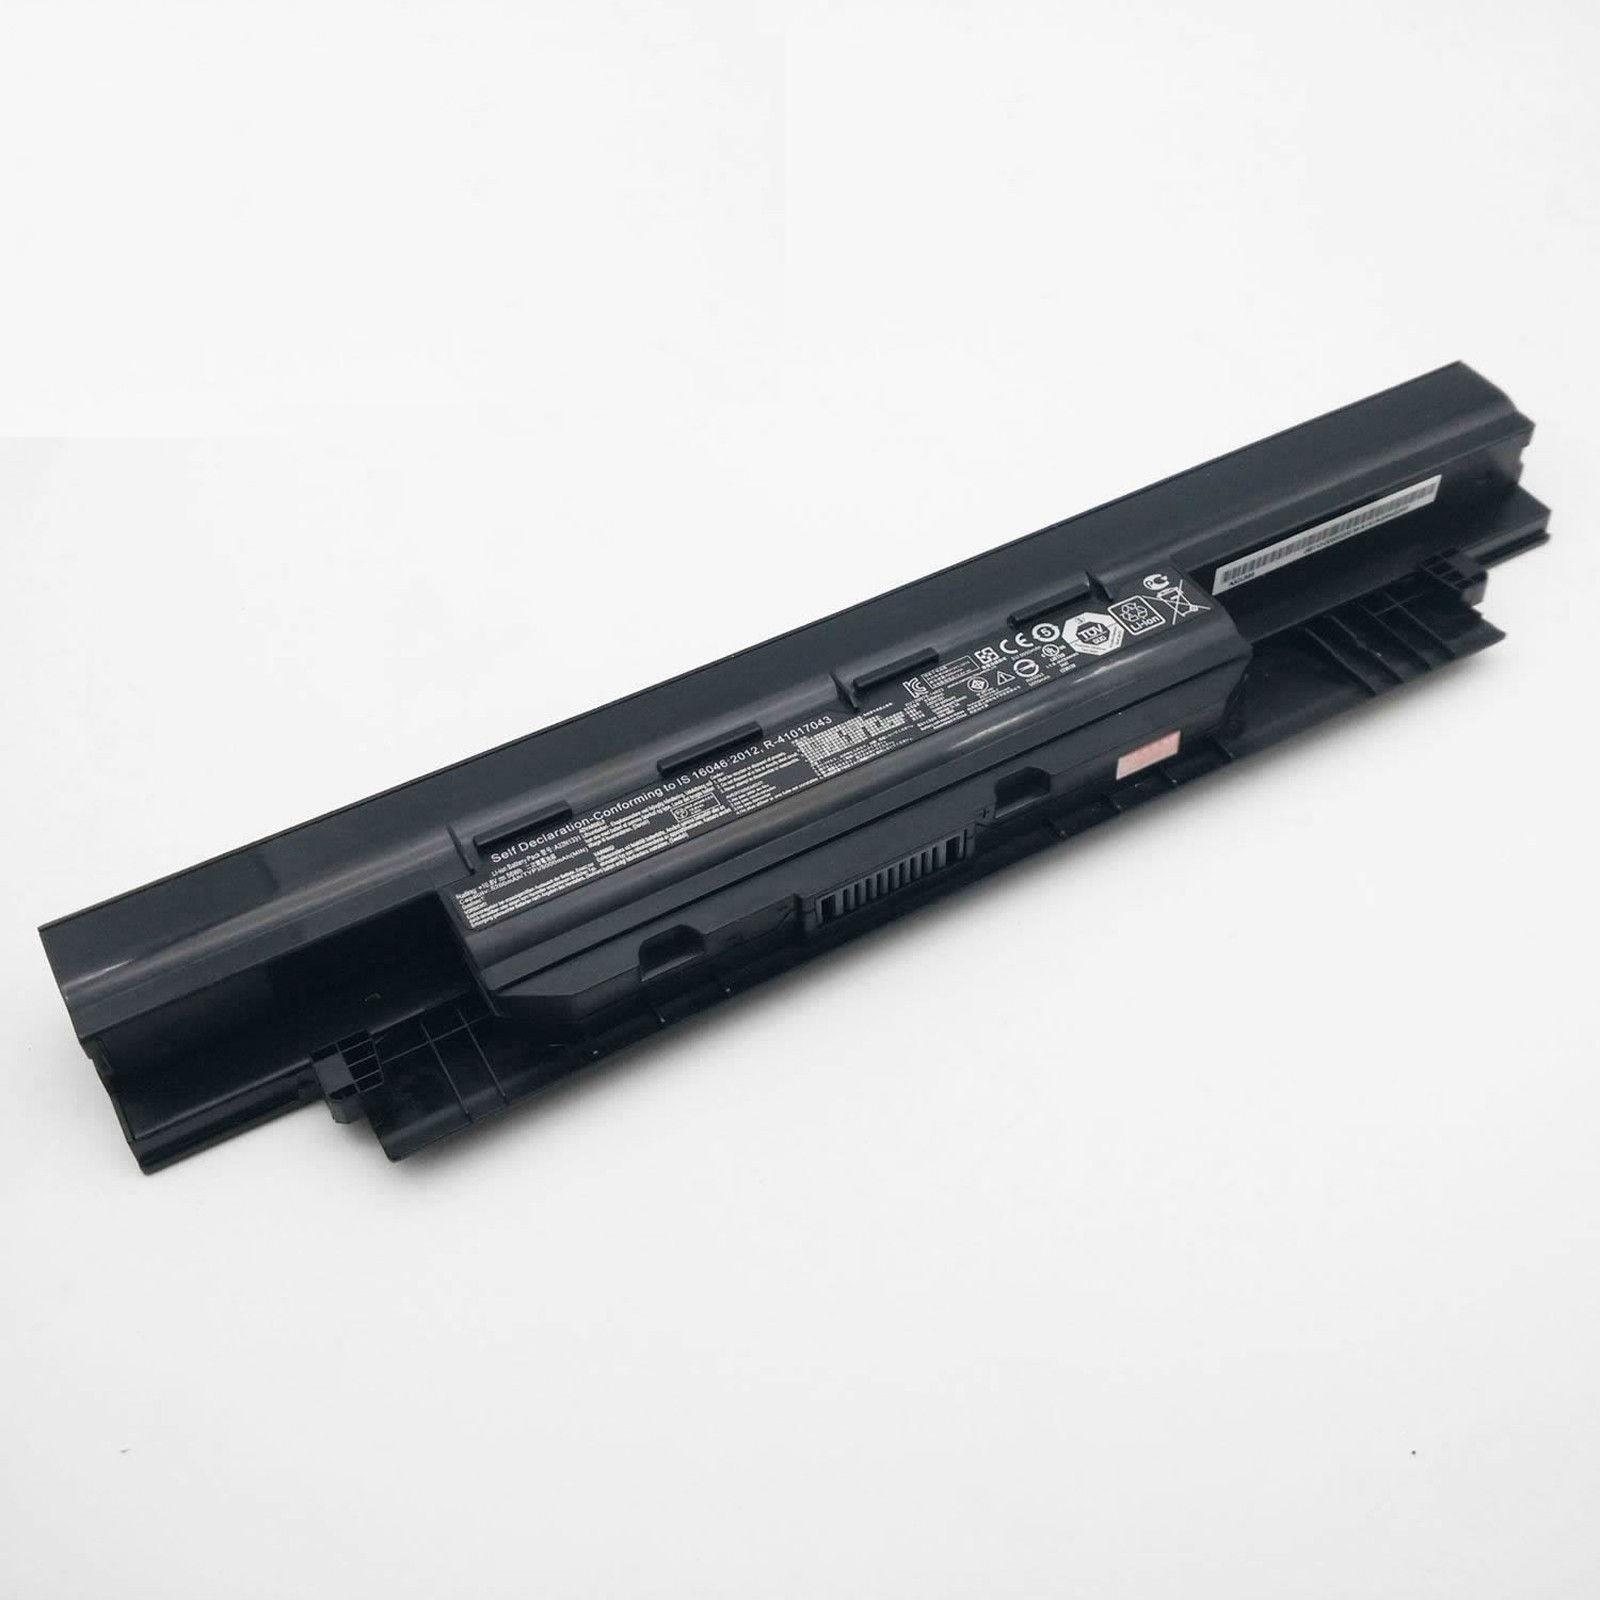 Batteri til ASUS 450 E451 E551 PU450 PU451 PU550 PU551 PRO450 (kompatibelt)